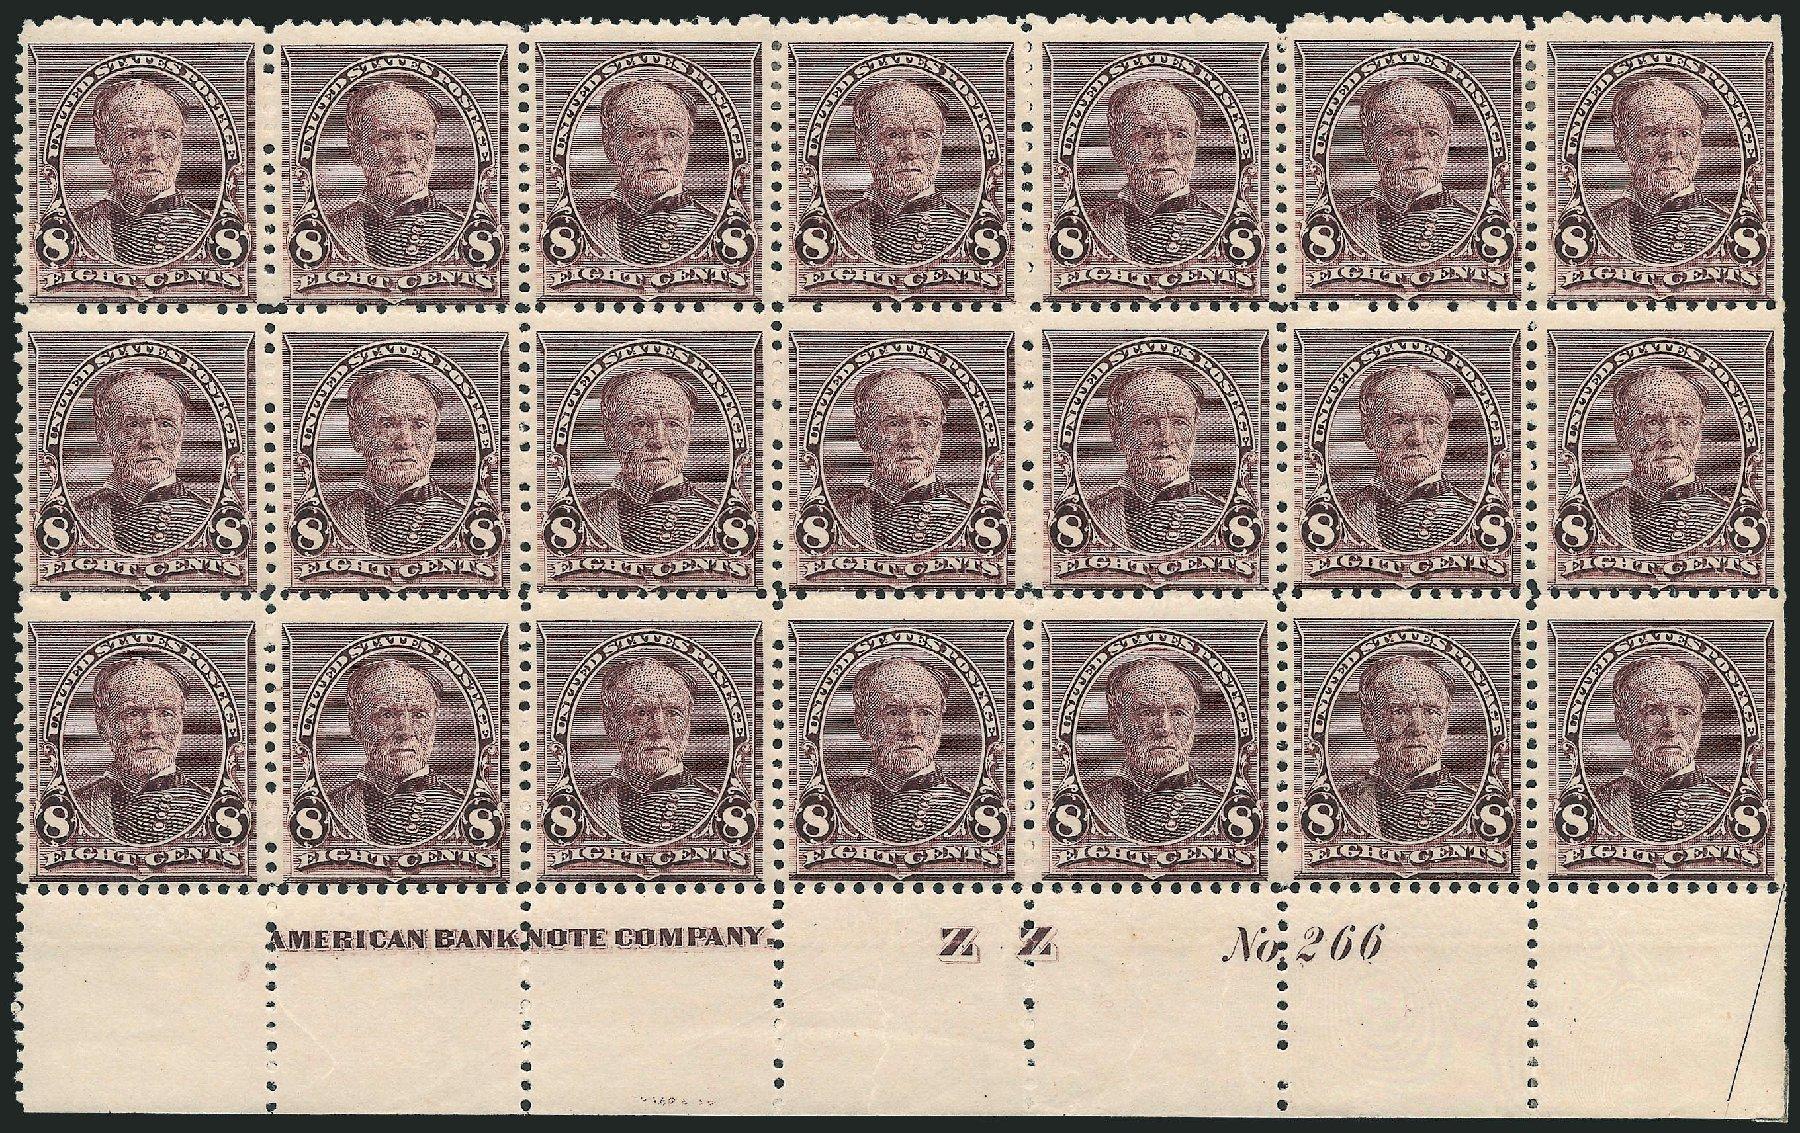 US Stamps Price Scott Cat. 225 - 1890 8c Sherman. Robert Siegel Auction Galleries, Mar 2013, Sale 1040, Lot 1467